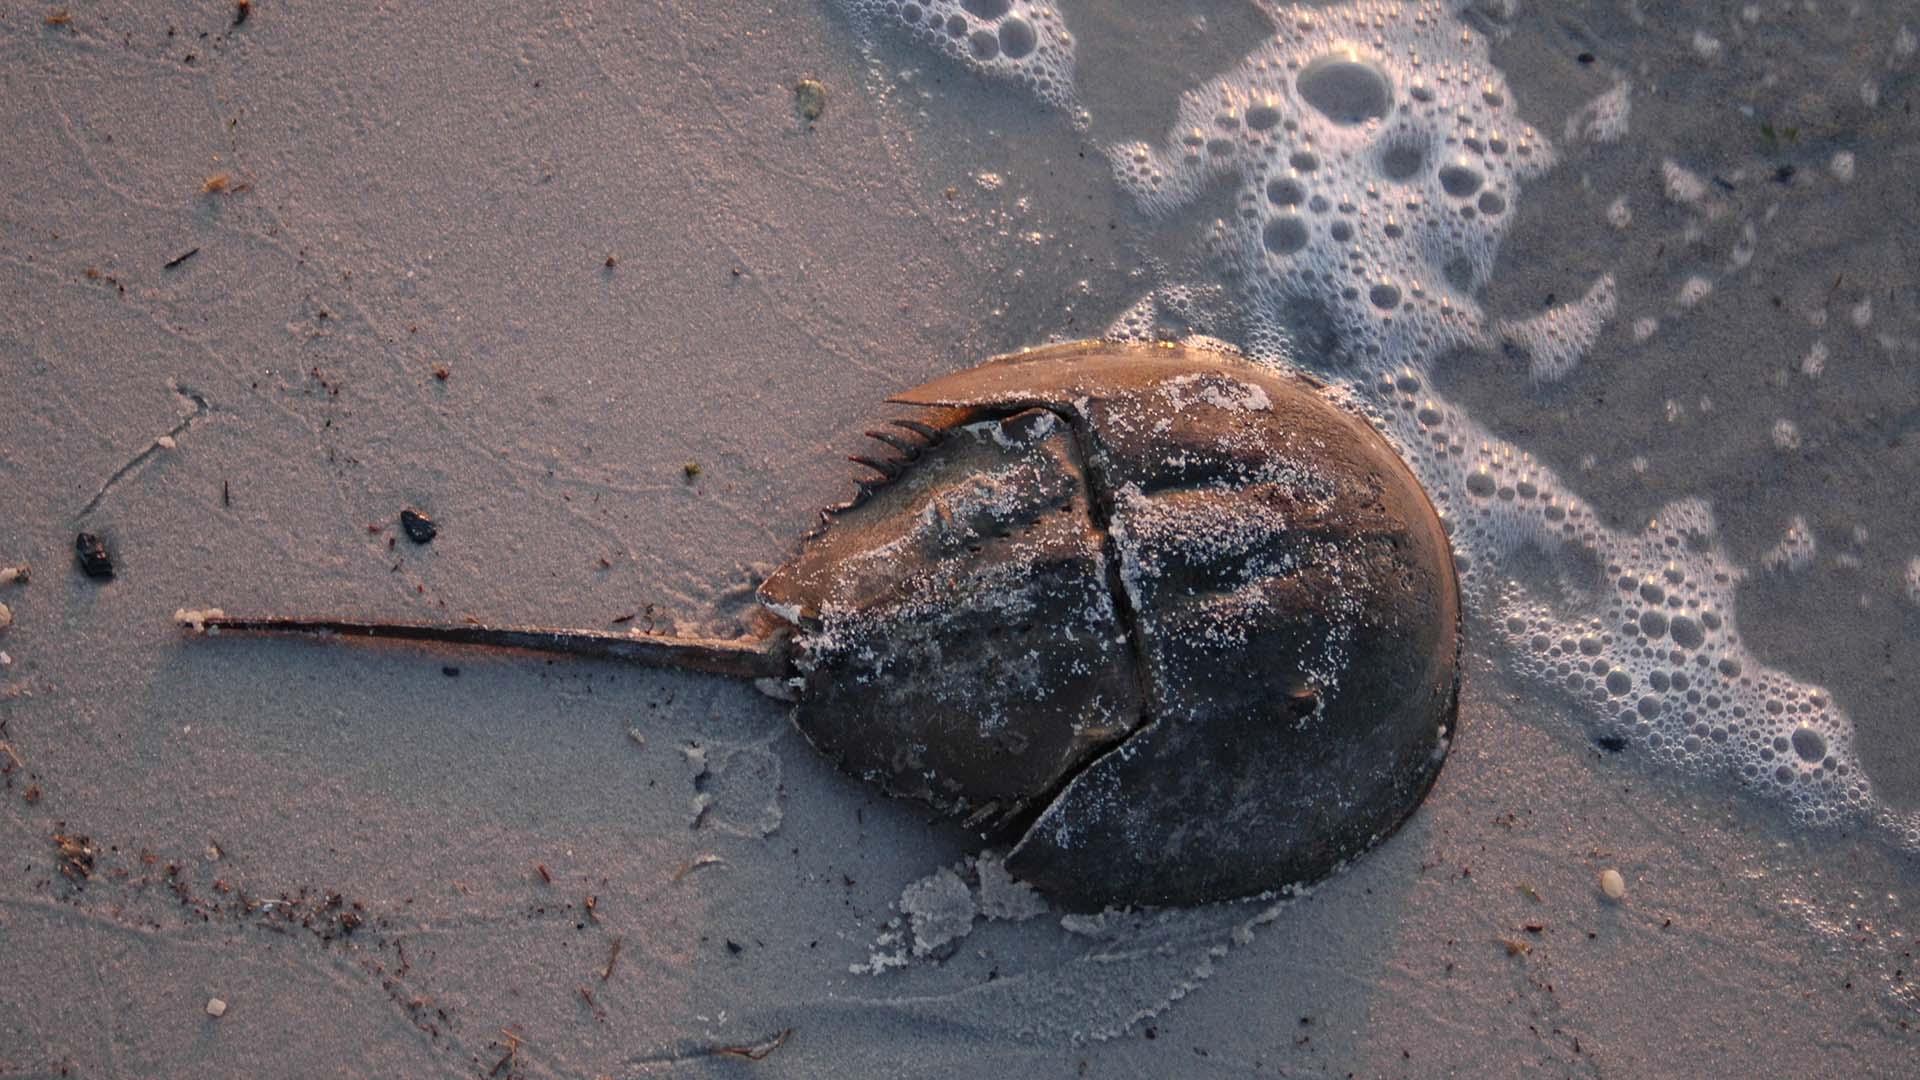 A horseshoe crab scuttles along the waterline. (Photo courtesy of NOAA Sea Grant)